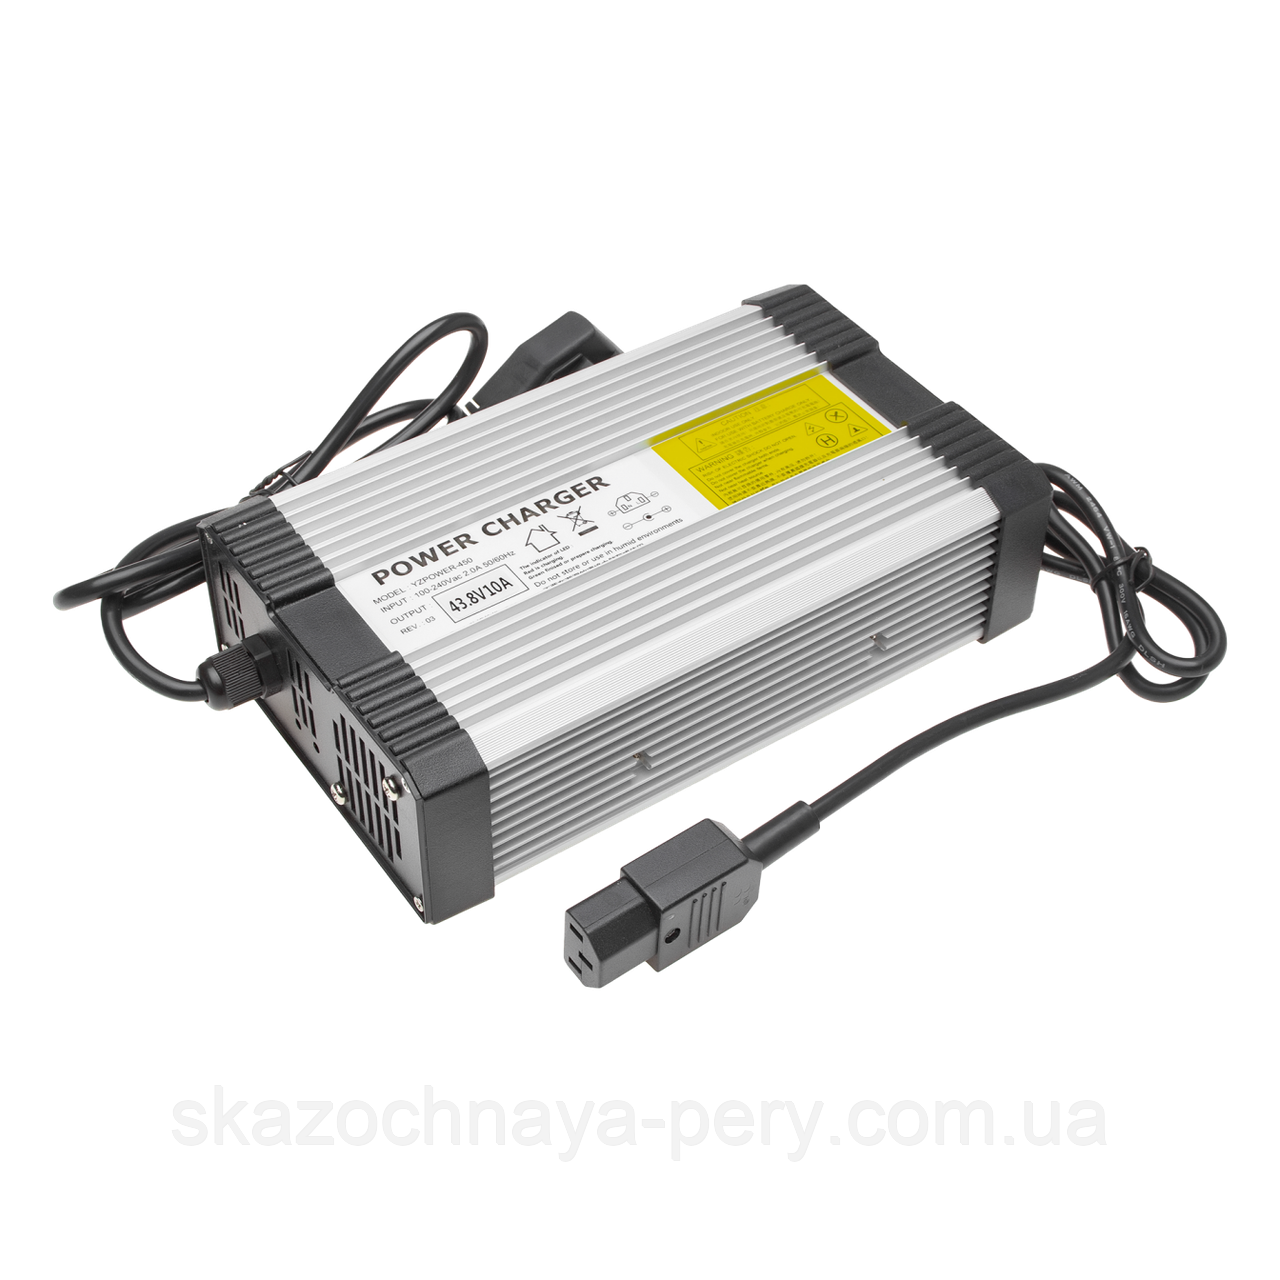 Зарядное устройство для аккумуляторов LiFePO4 36V (43.8V)-10A-360W